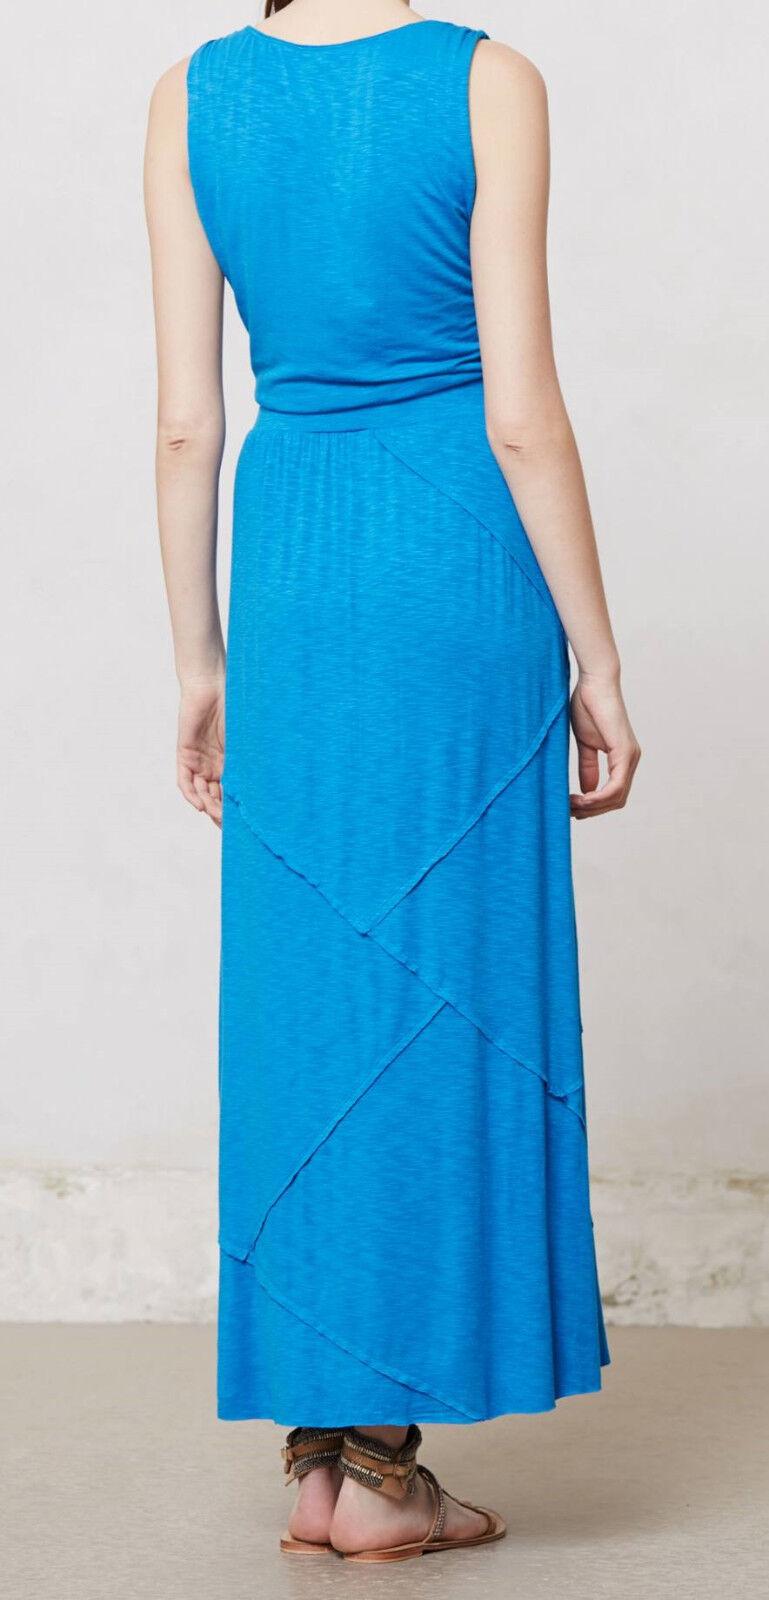 T-Shirt by Dolan Dolan Dolan Sapphire Day Maxi Dress Sizes M, L blueee NW ANTHROPOLOGIE Tag 442fa5